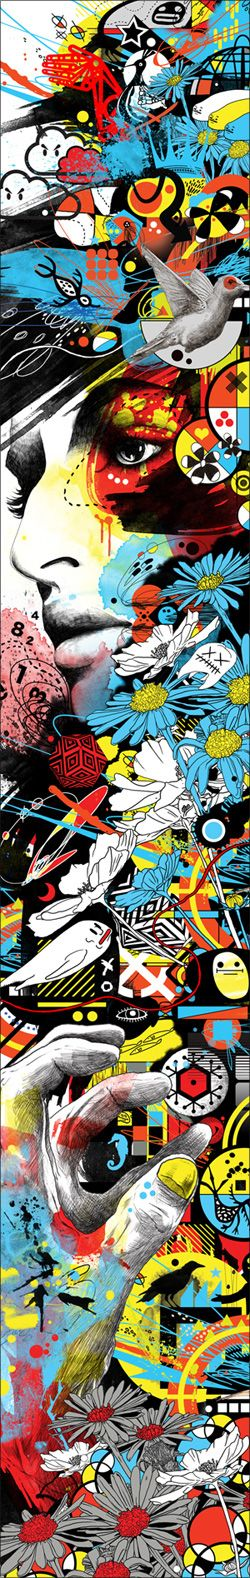 MARUMIYAN(マルミヤン) Graphic Artist / Designer / Illustrator